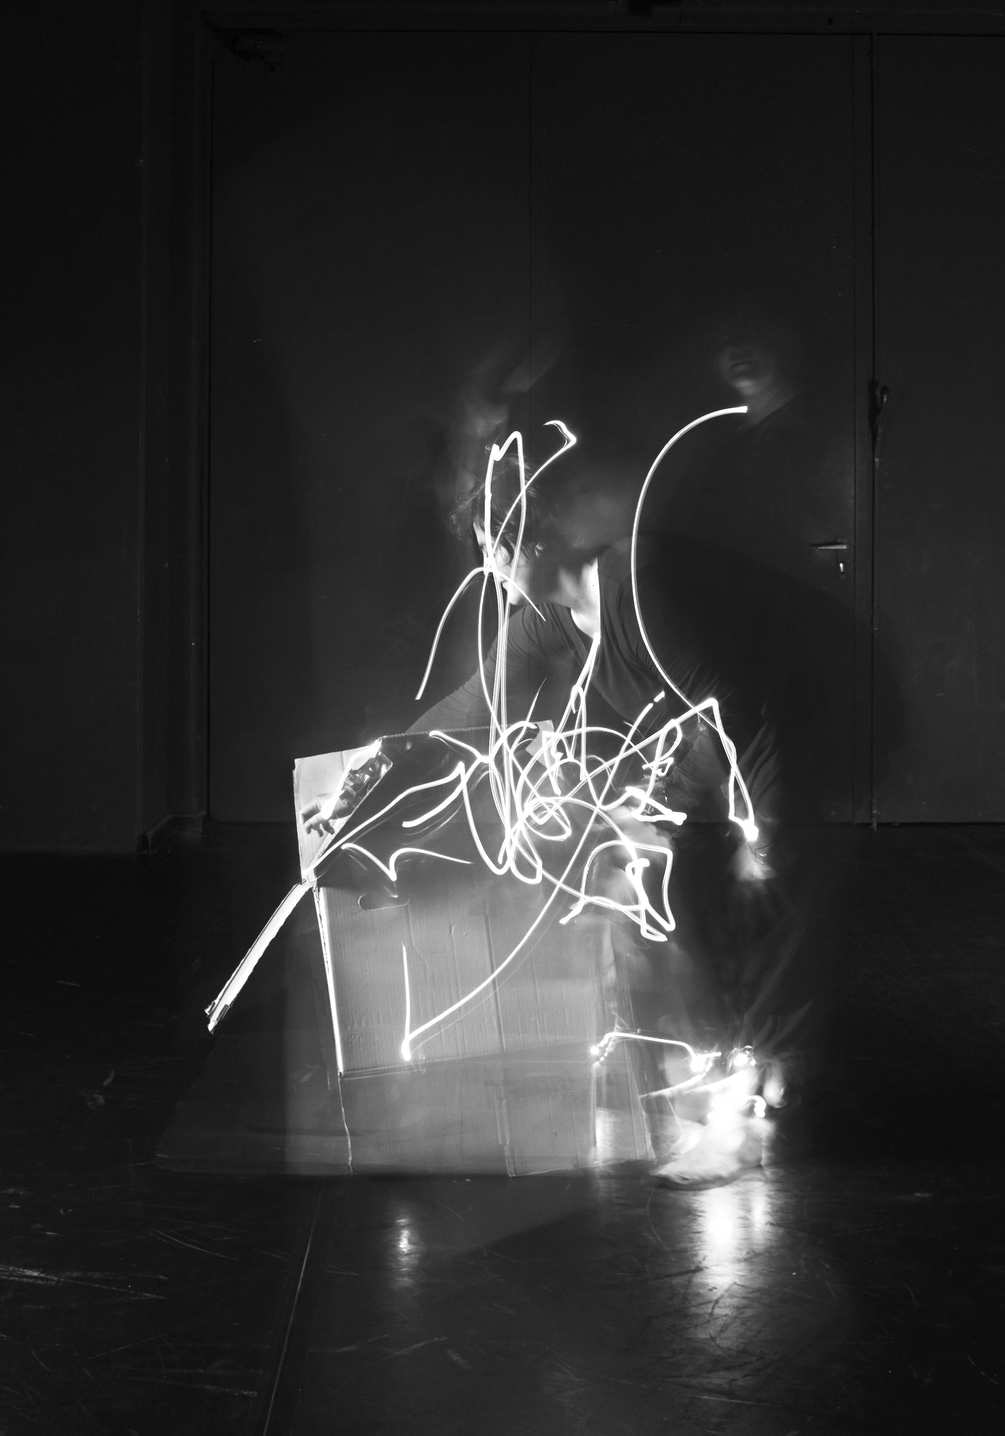 tracking-dance-folding-a-moving-box-1005x1435px